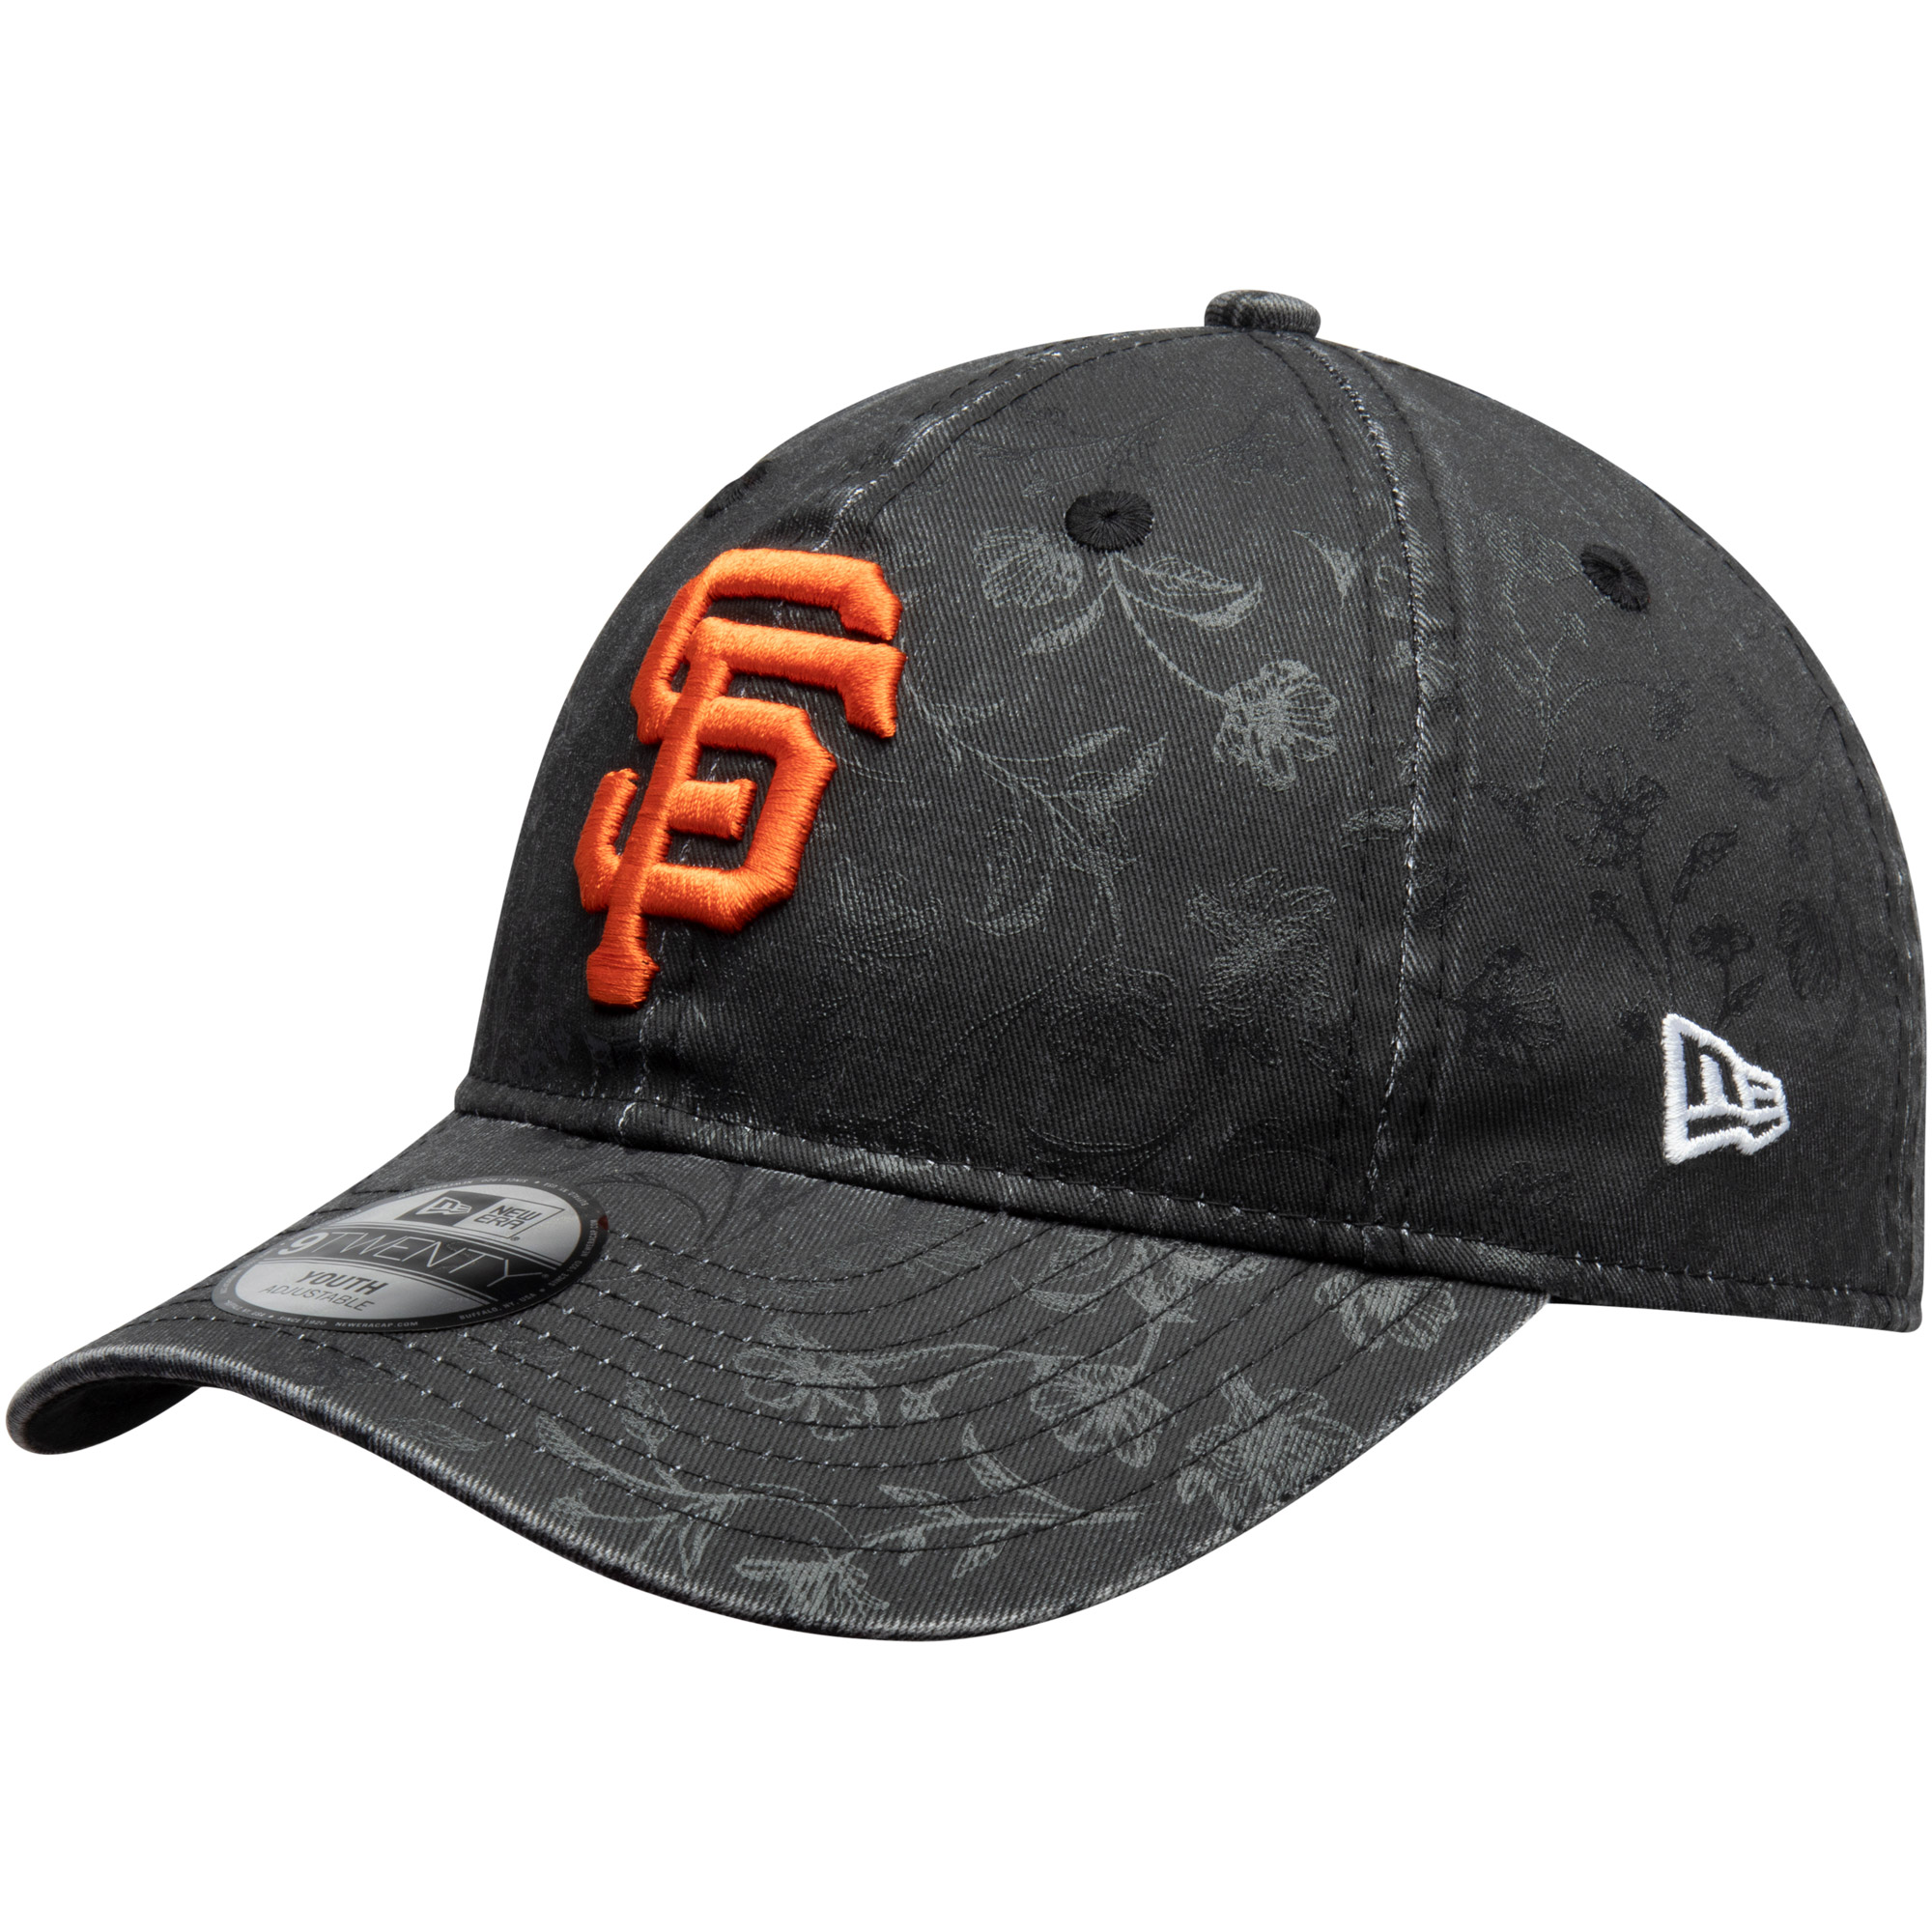 San Francisco Giants New Era Girls Youth Floral Peek 9TWENTY Adjustable Hat - Black - OSFA